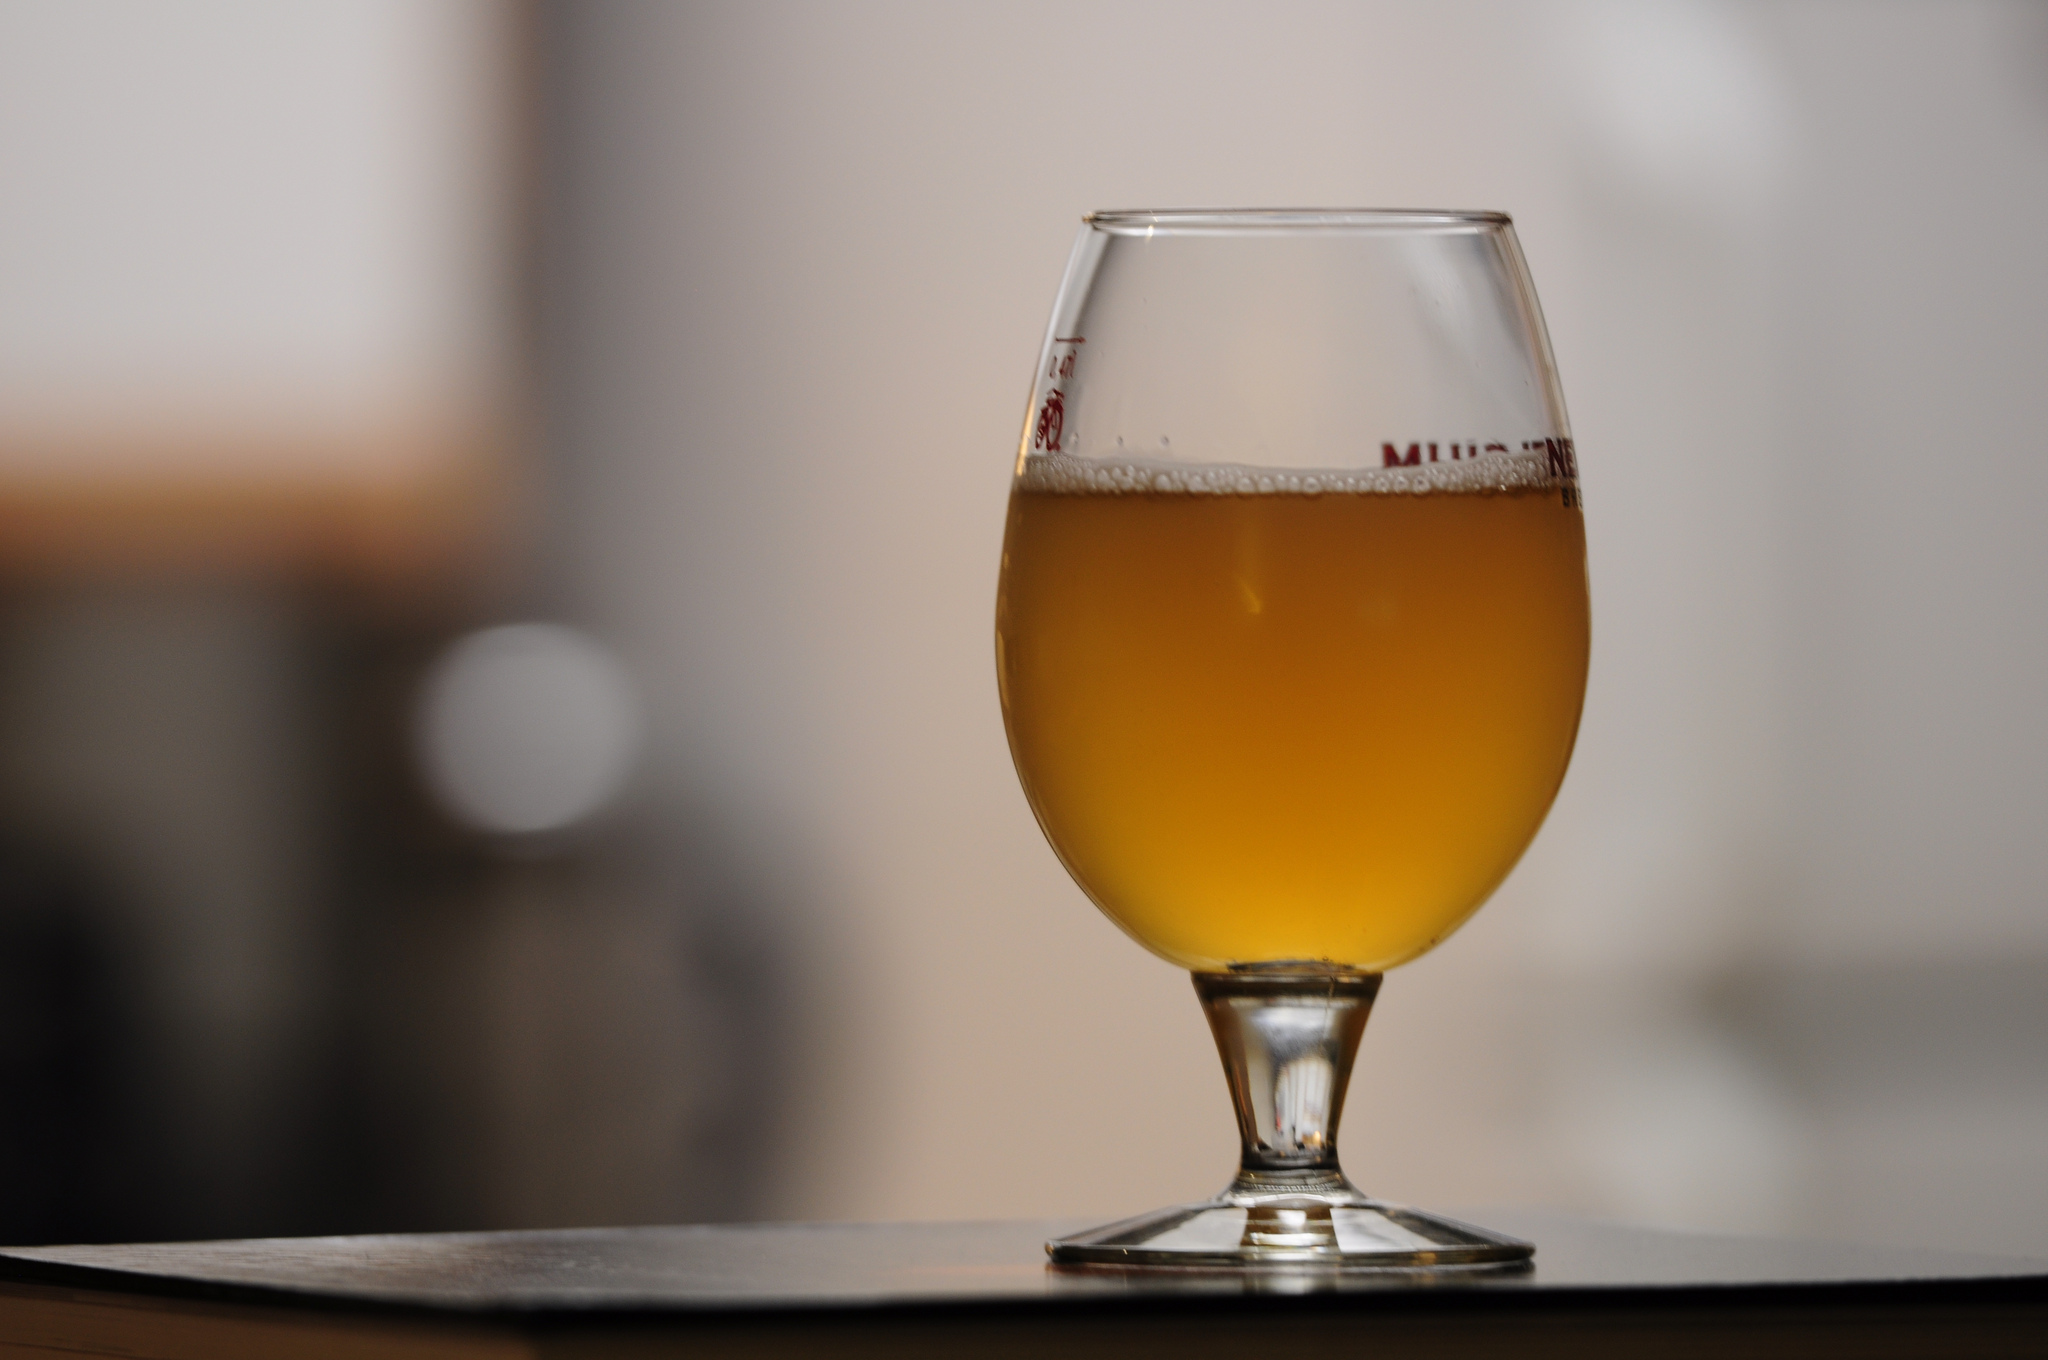 saison beer